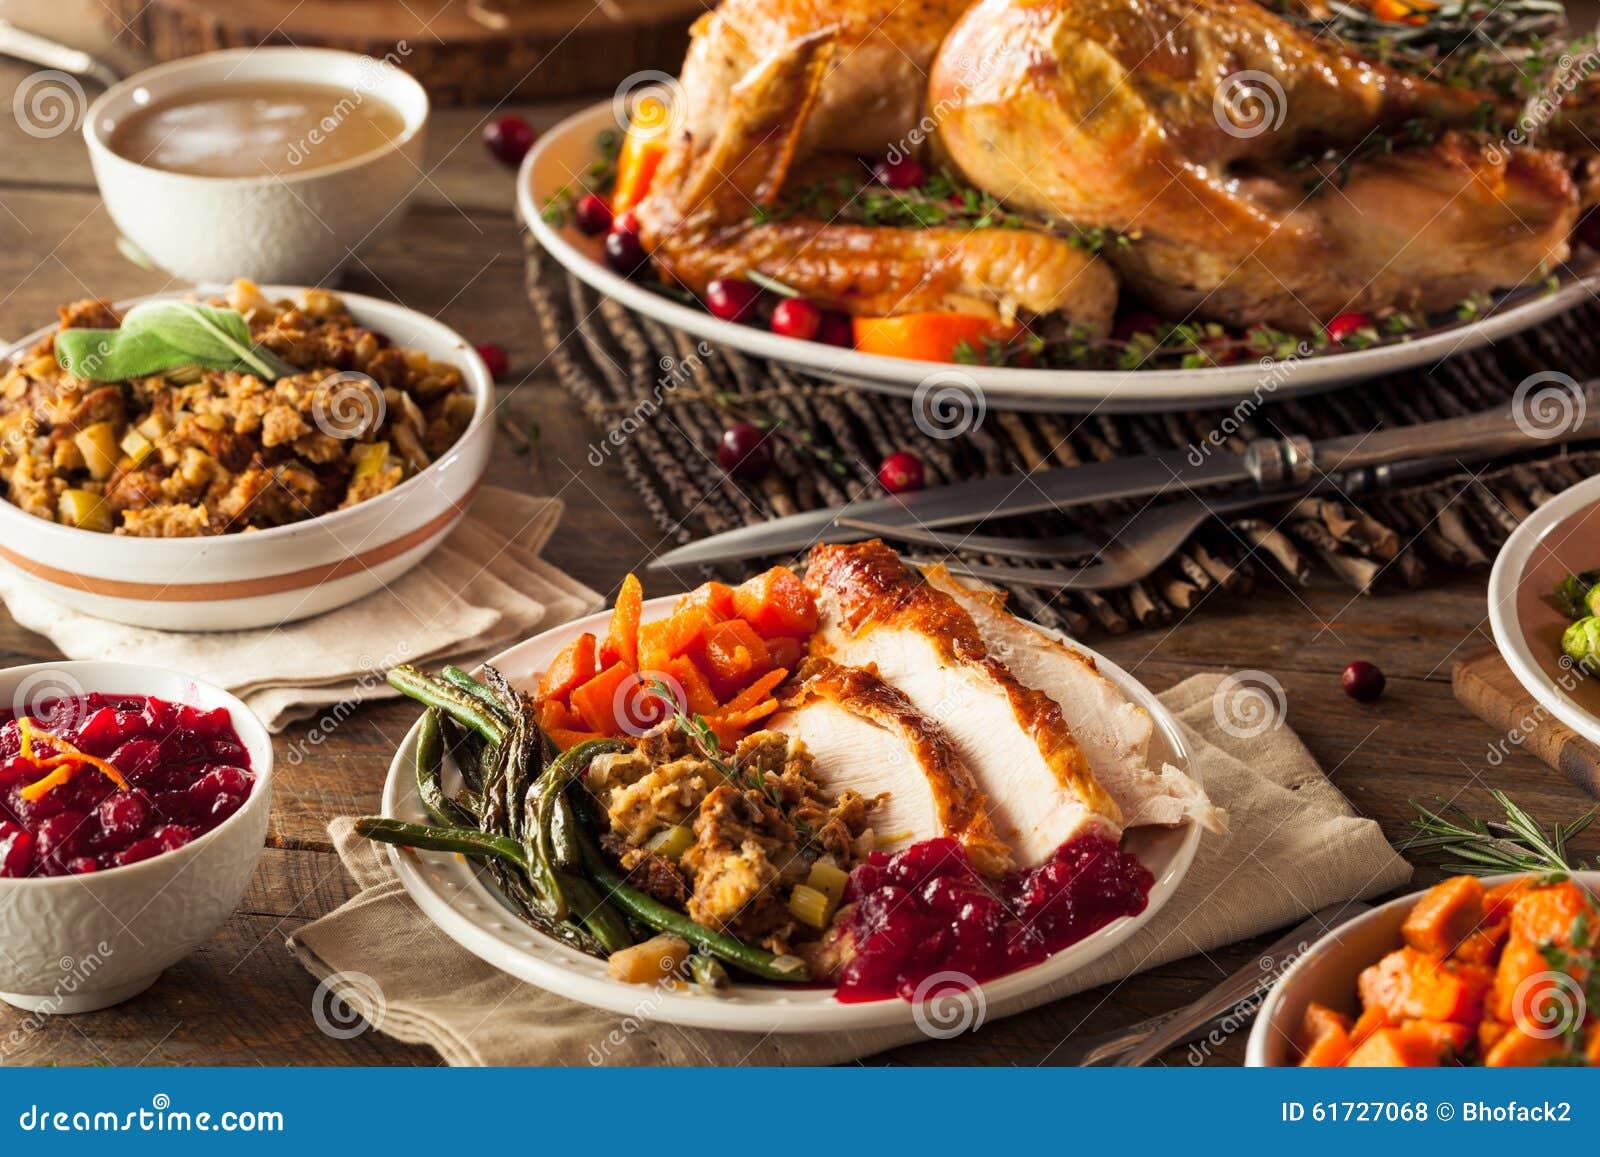 Plein dîner fait maison de thanksgiving